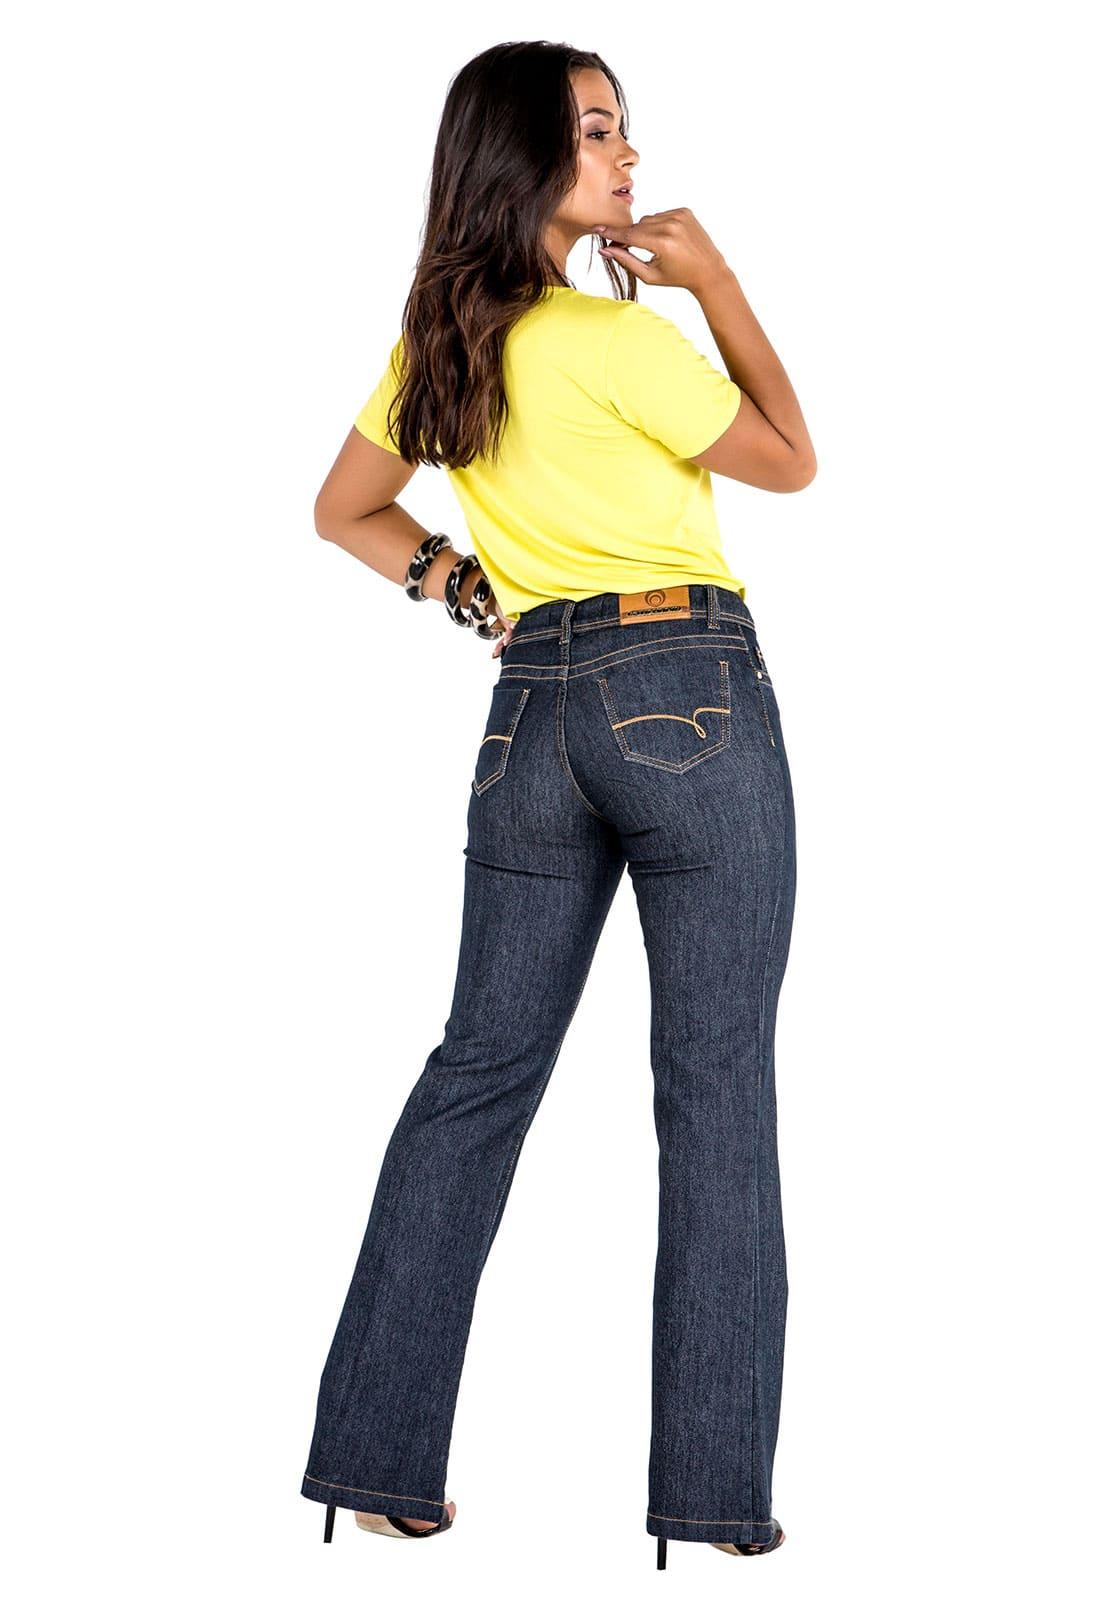 Calça Tradicional Feminina Jeans Flare